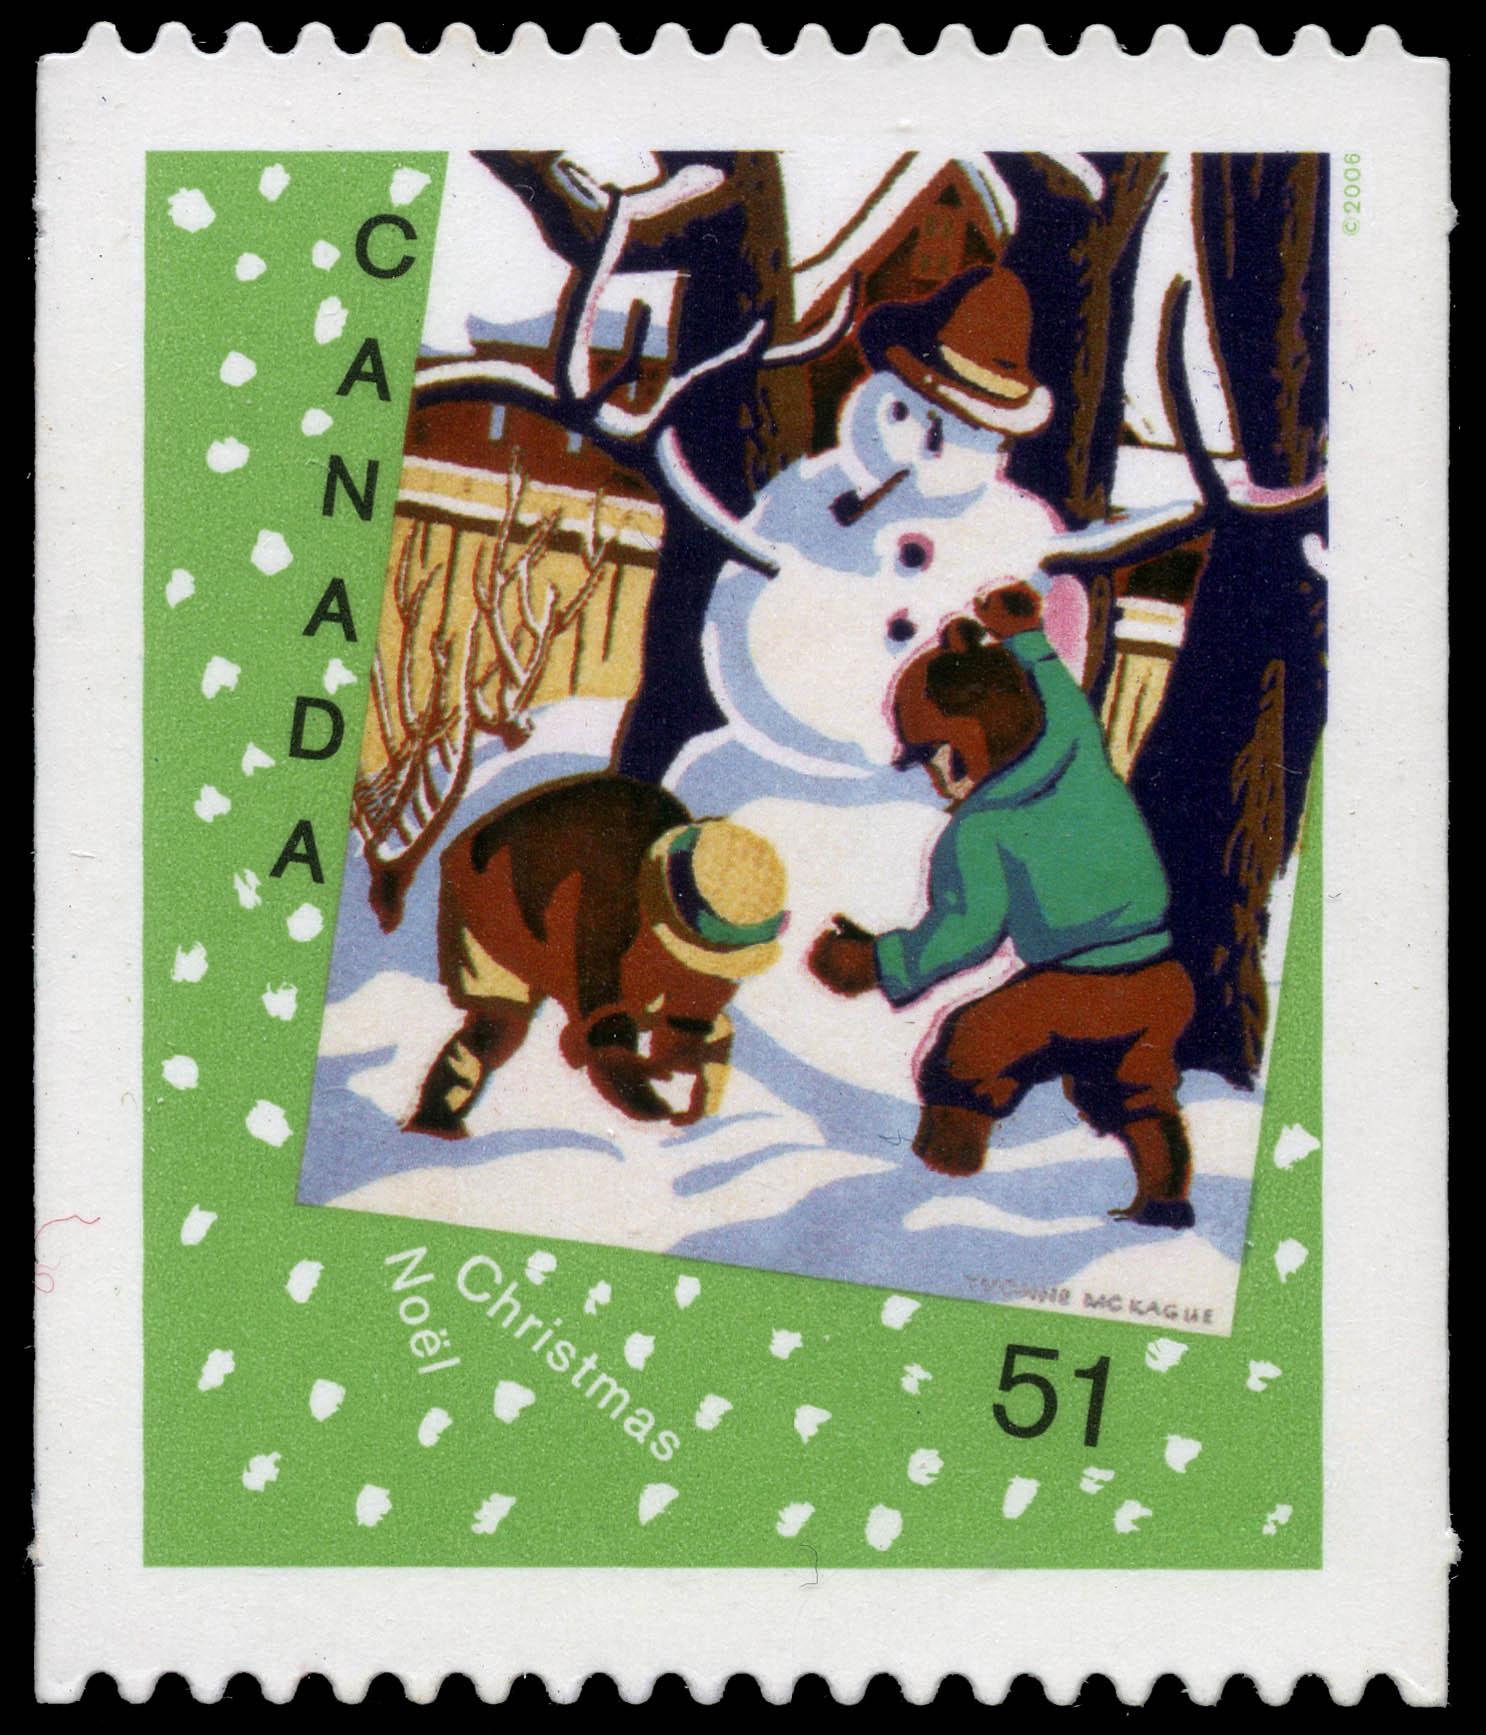 Snowman Canada Postage Stamp | Christmas : Christmas cards